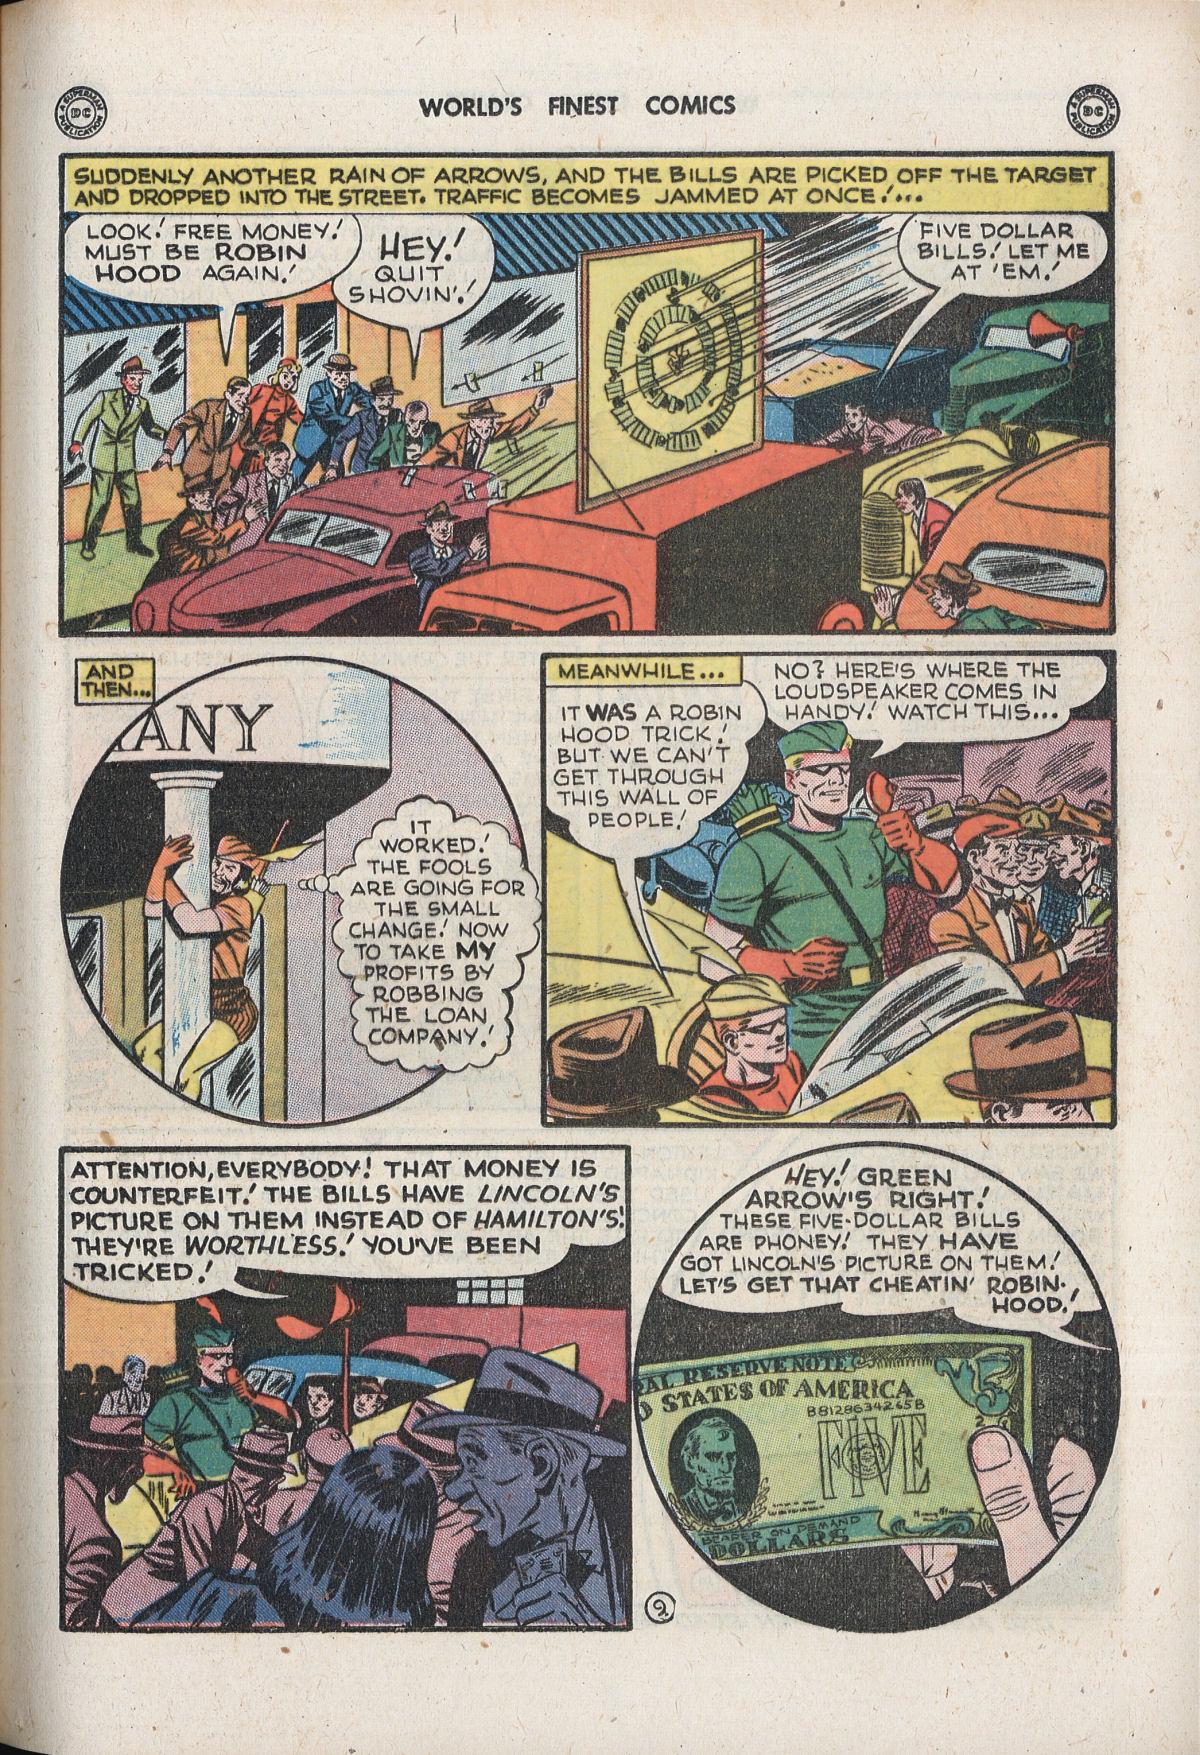 Read online World's Finest Comics comic -  Issue #33 - 25